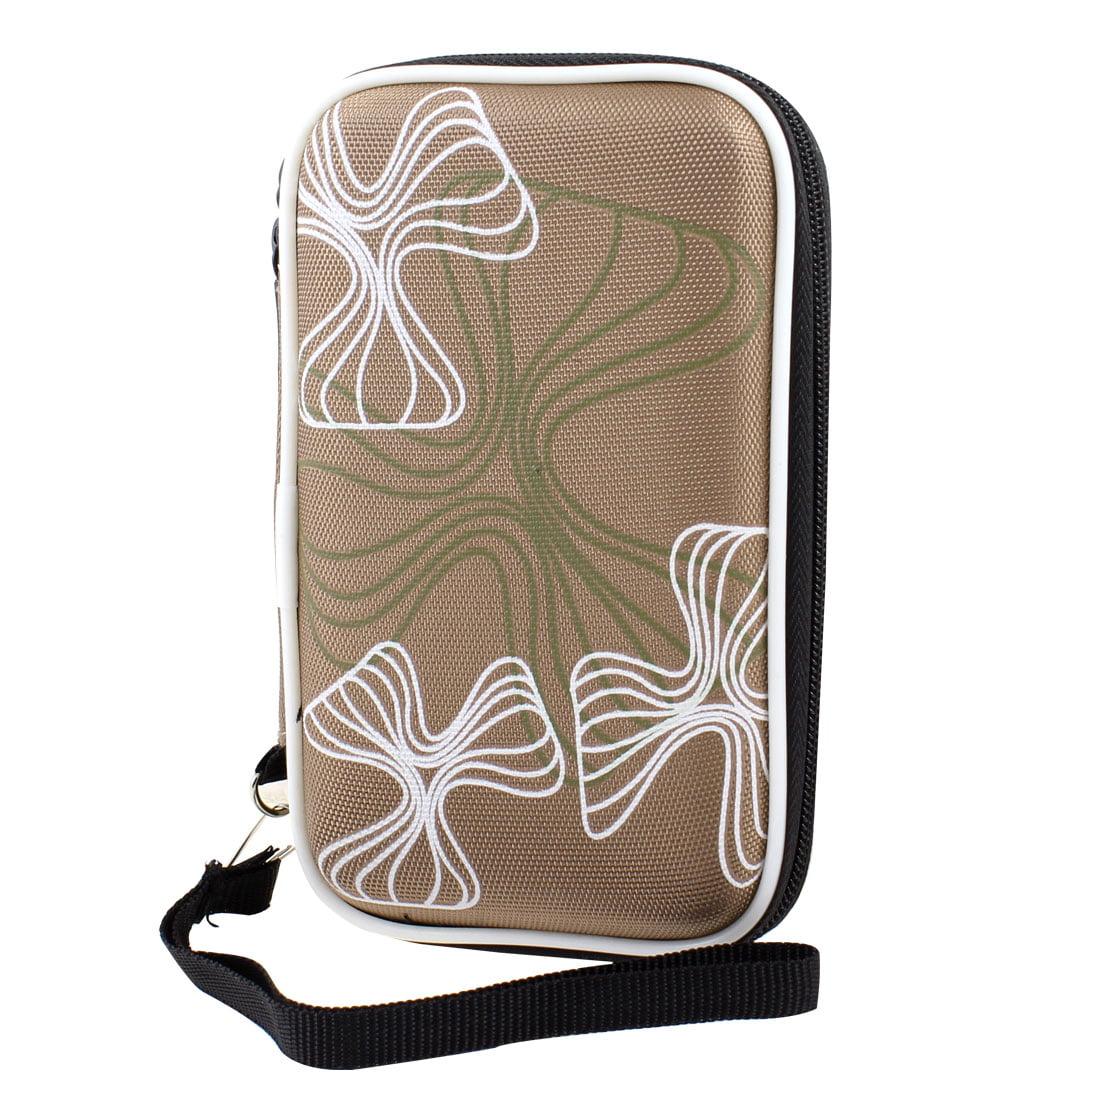 "Unique Bargains Khaki Carrying Case Cover Bag Pouch Zip-up Wallet for 2.5"" Hard Drive Disk"